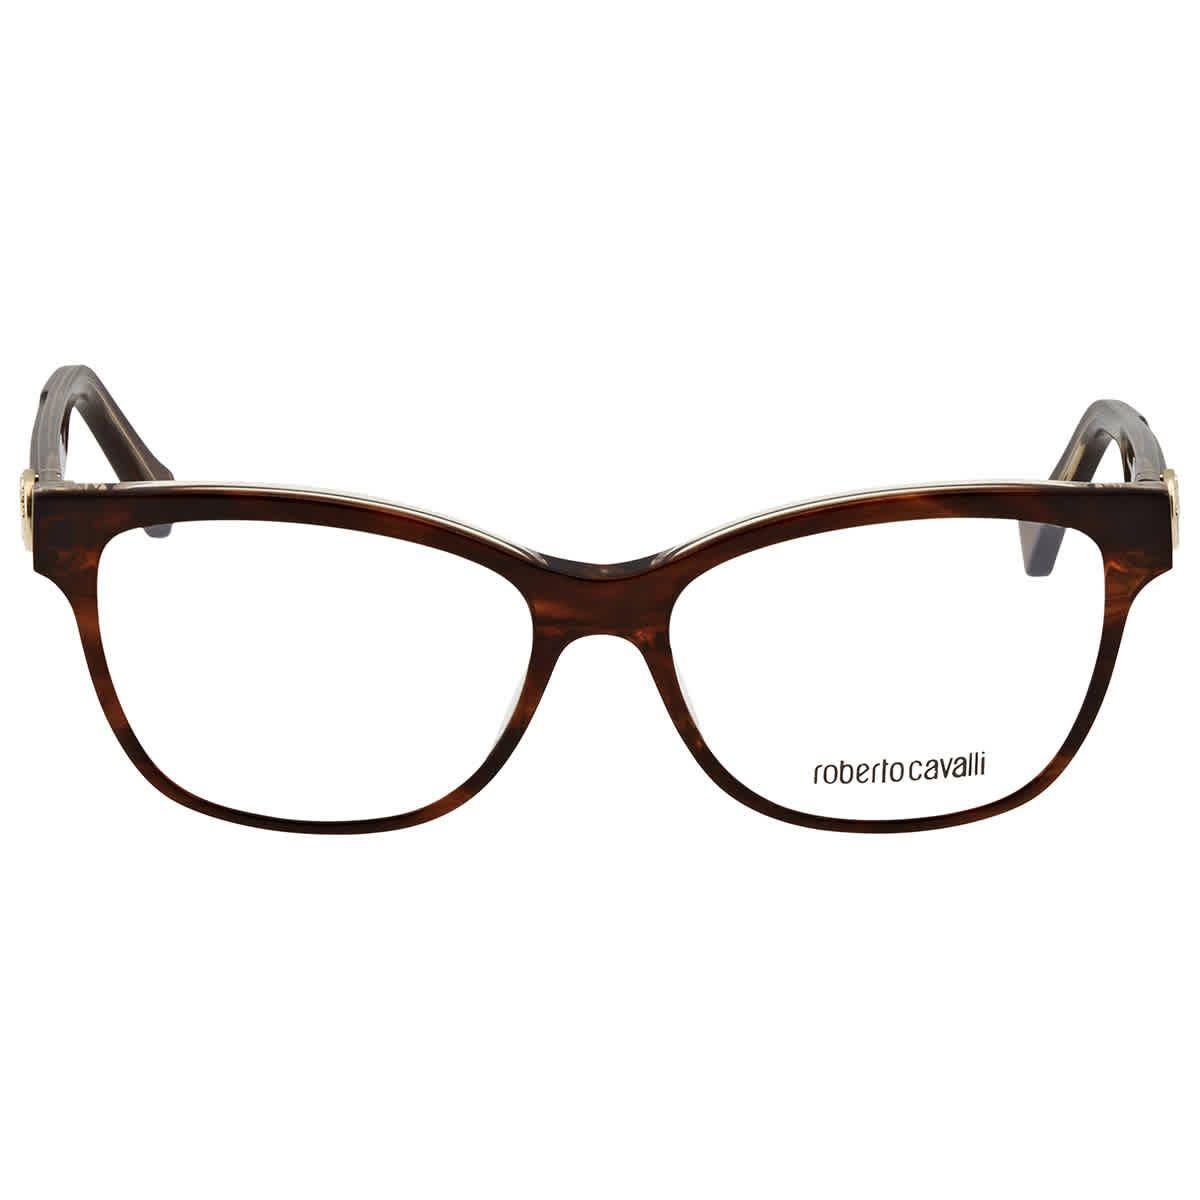 Roberto Cavalli Eyeglasses. Color: Demo Lens. Shape: Rectangular. Lens Width: 53 mm. Frame Material: Plastic. Frame Color: Brown. UPC/EAN code: 664689923977. Roberto Cavalli Ladies Eyeglass Frames RC5050A5653.